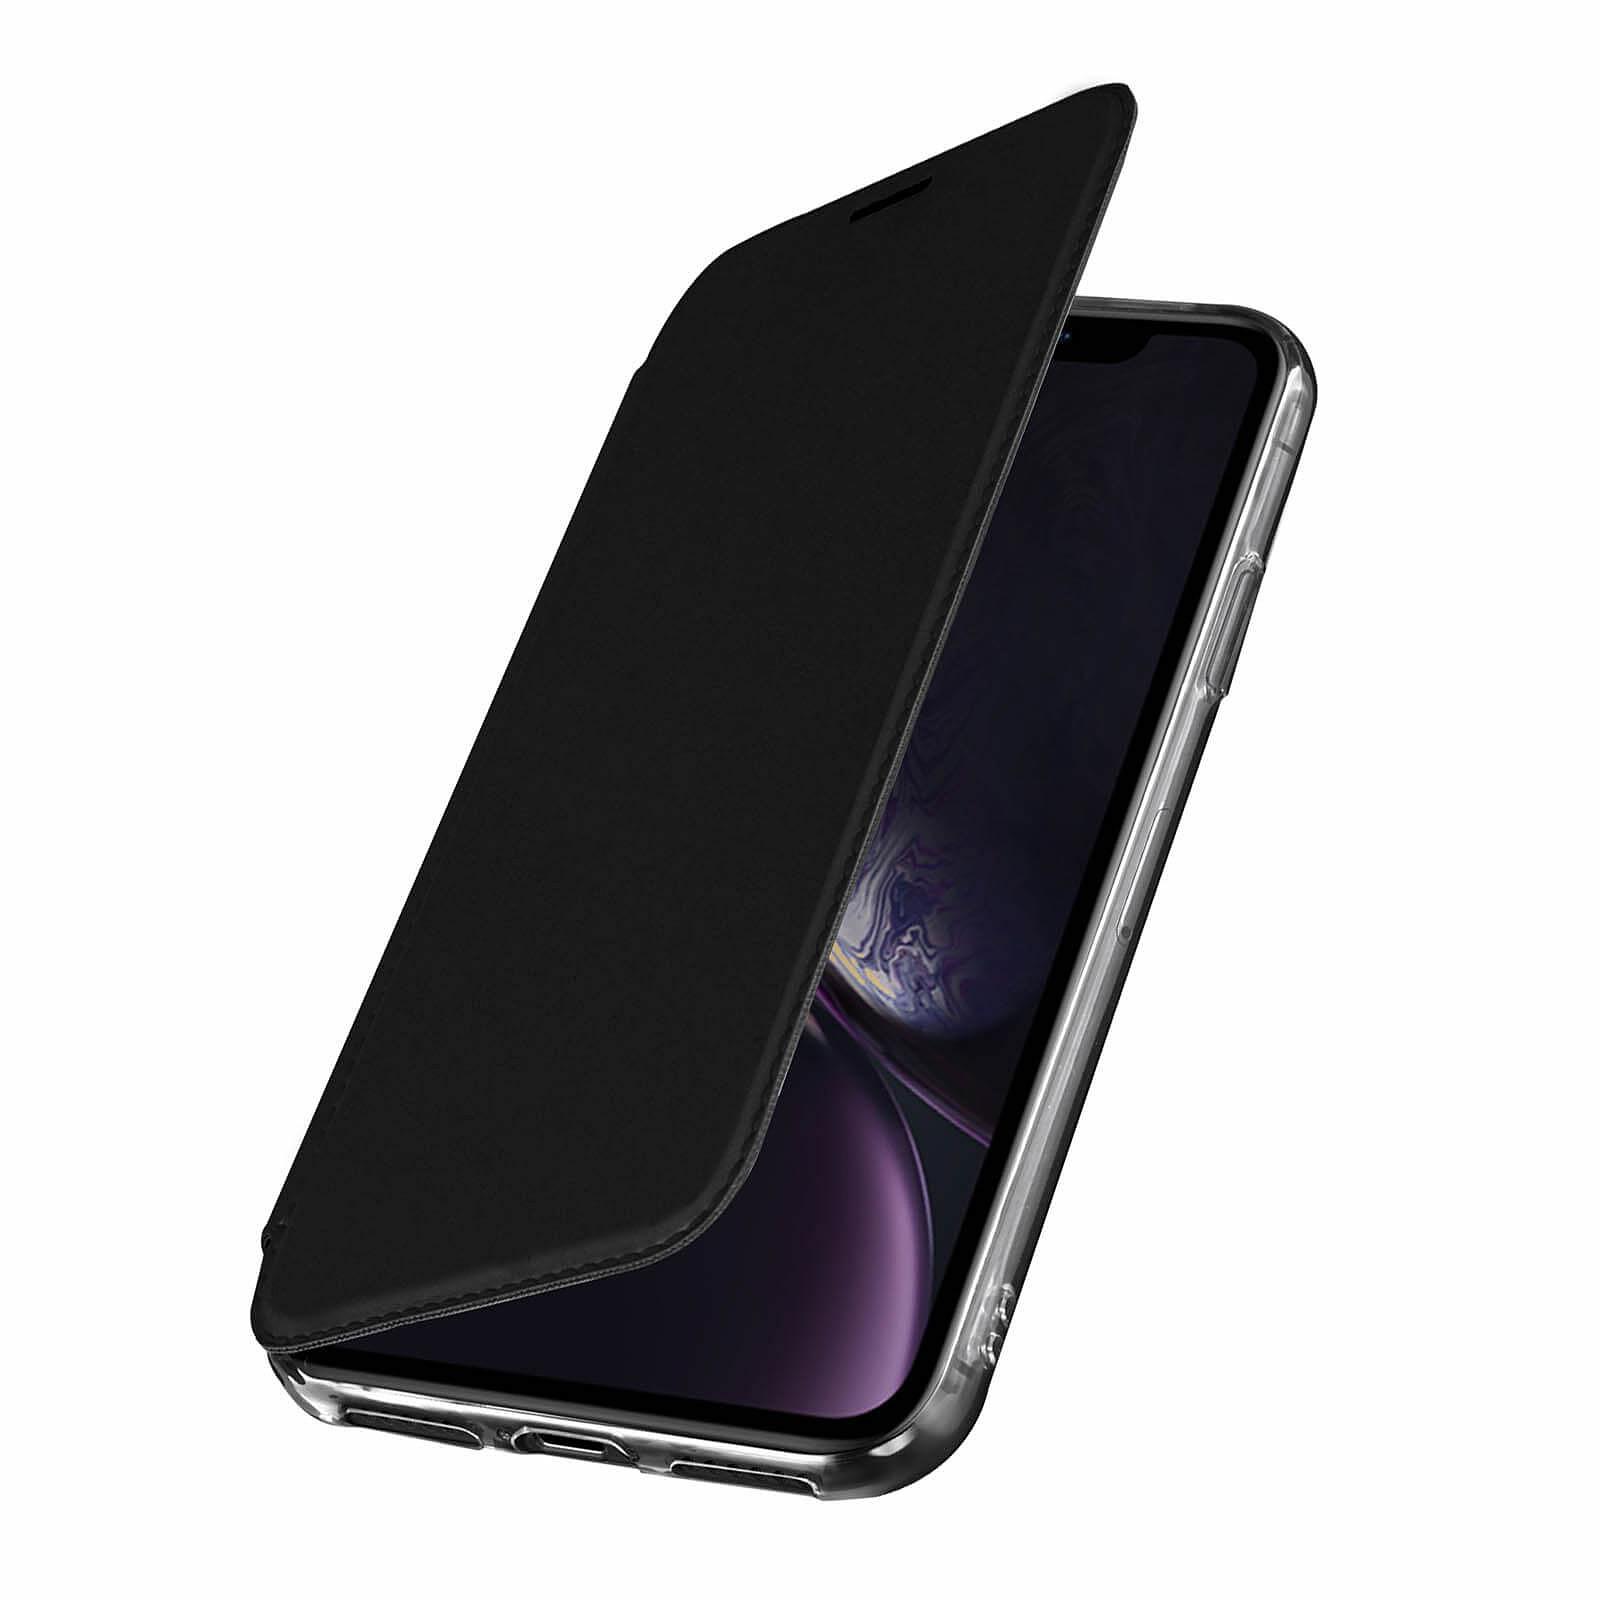 Avizar Etui folio Noir Miroir pour Apple iPhone XR